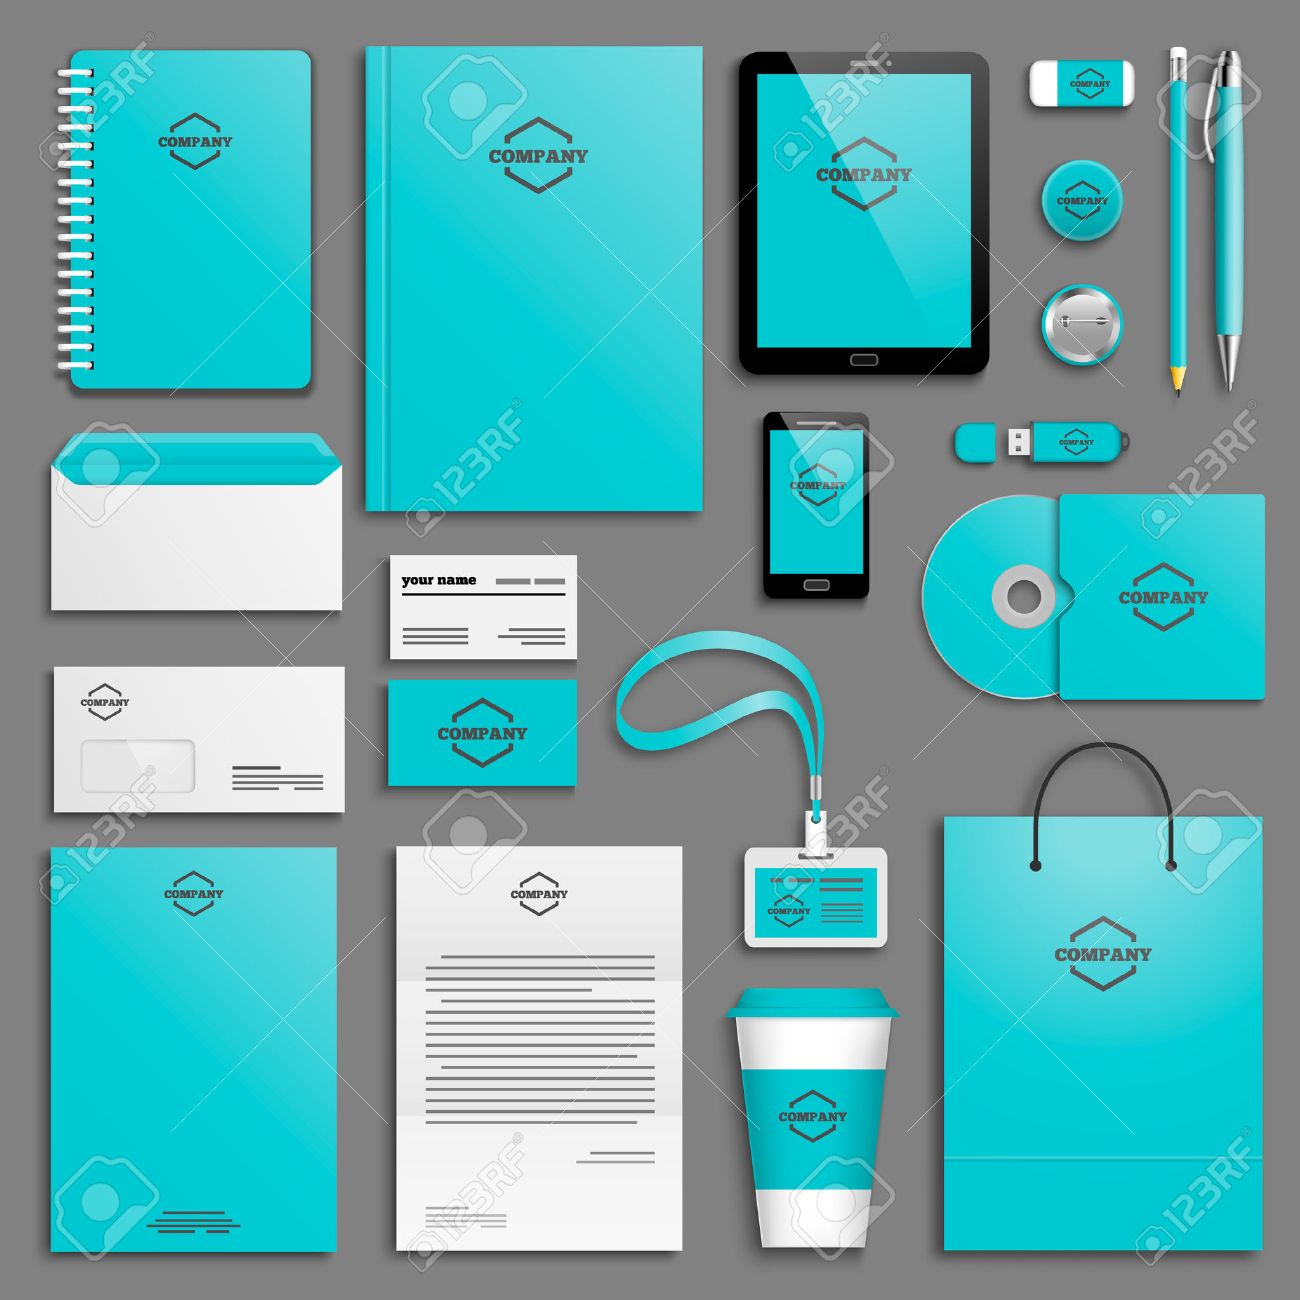 corporate identity template set business stationery mock up